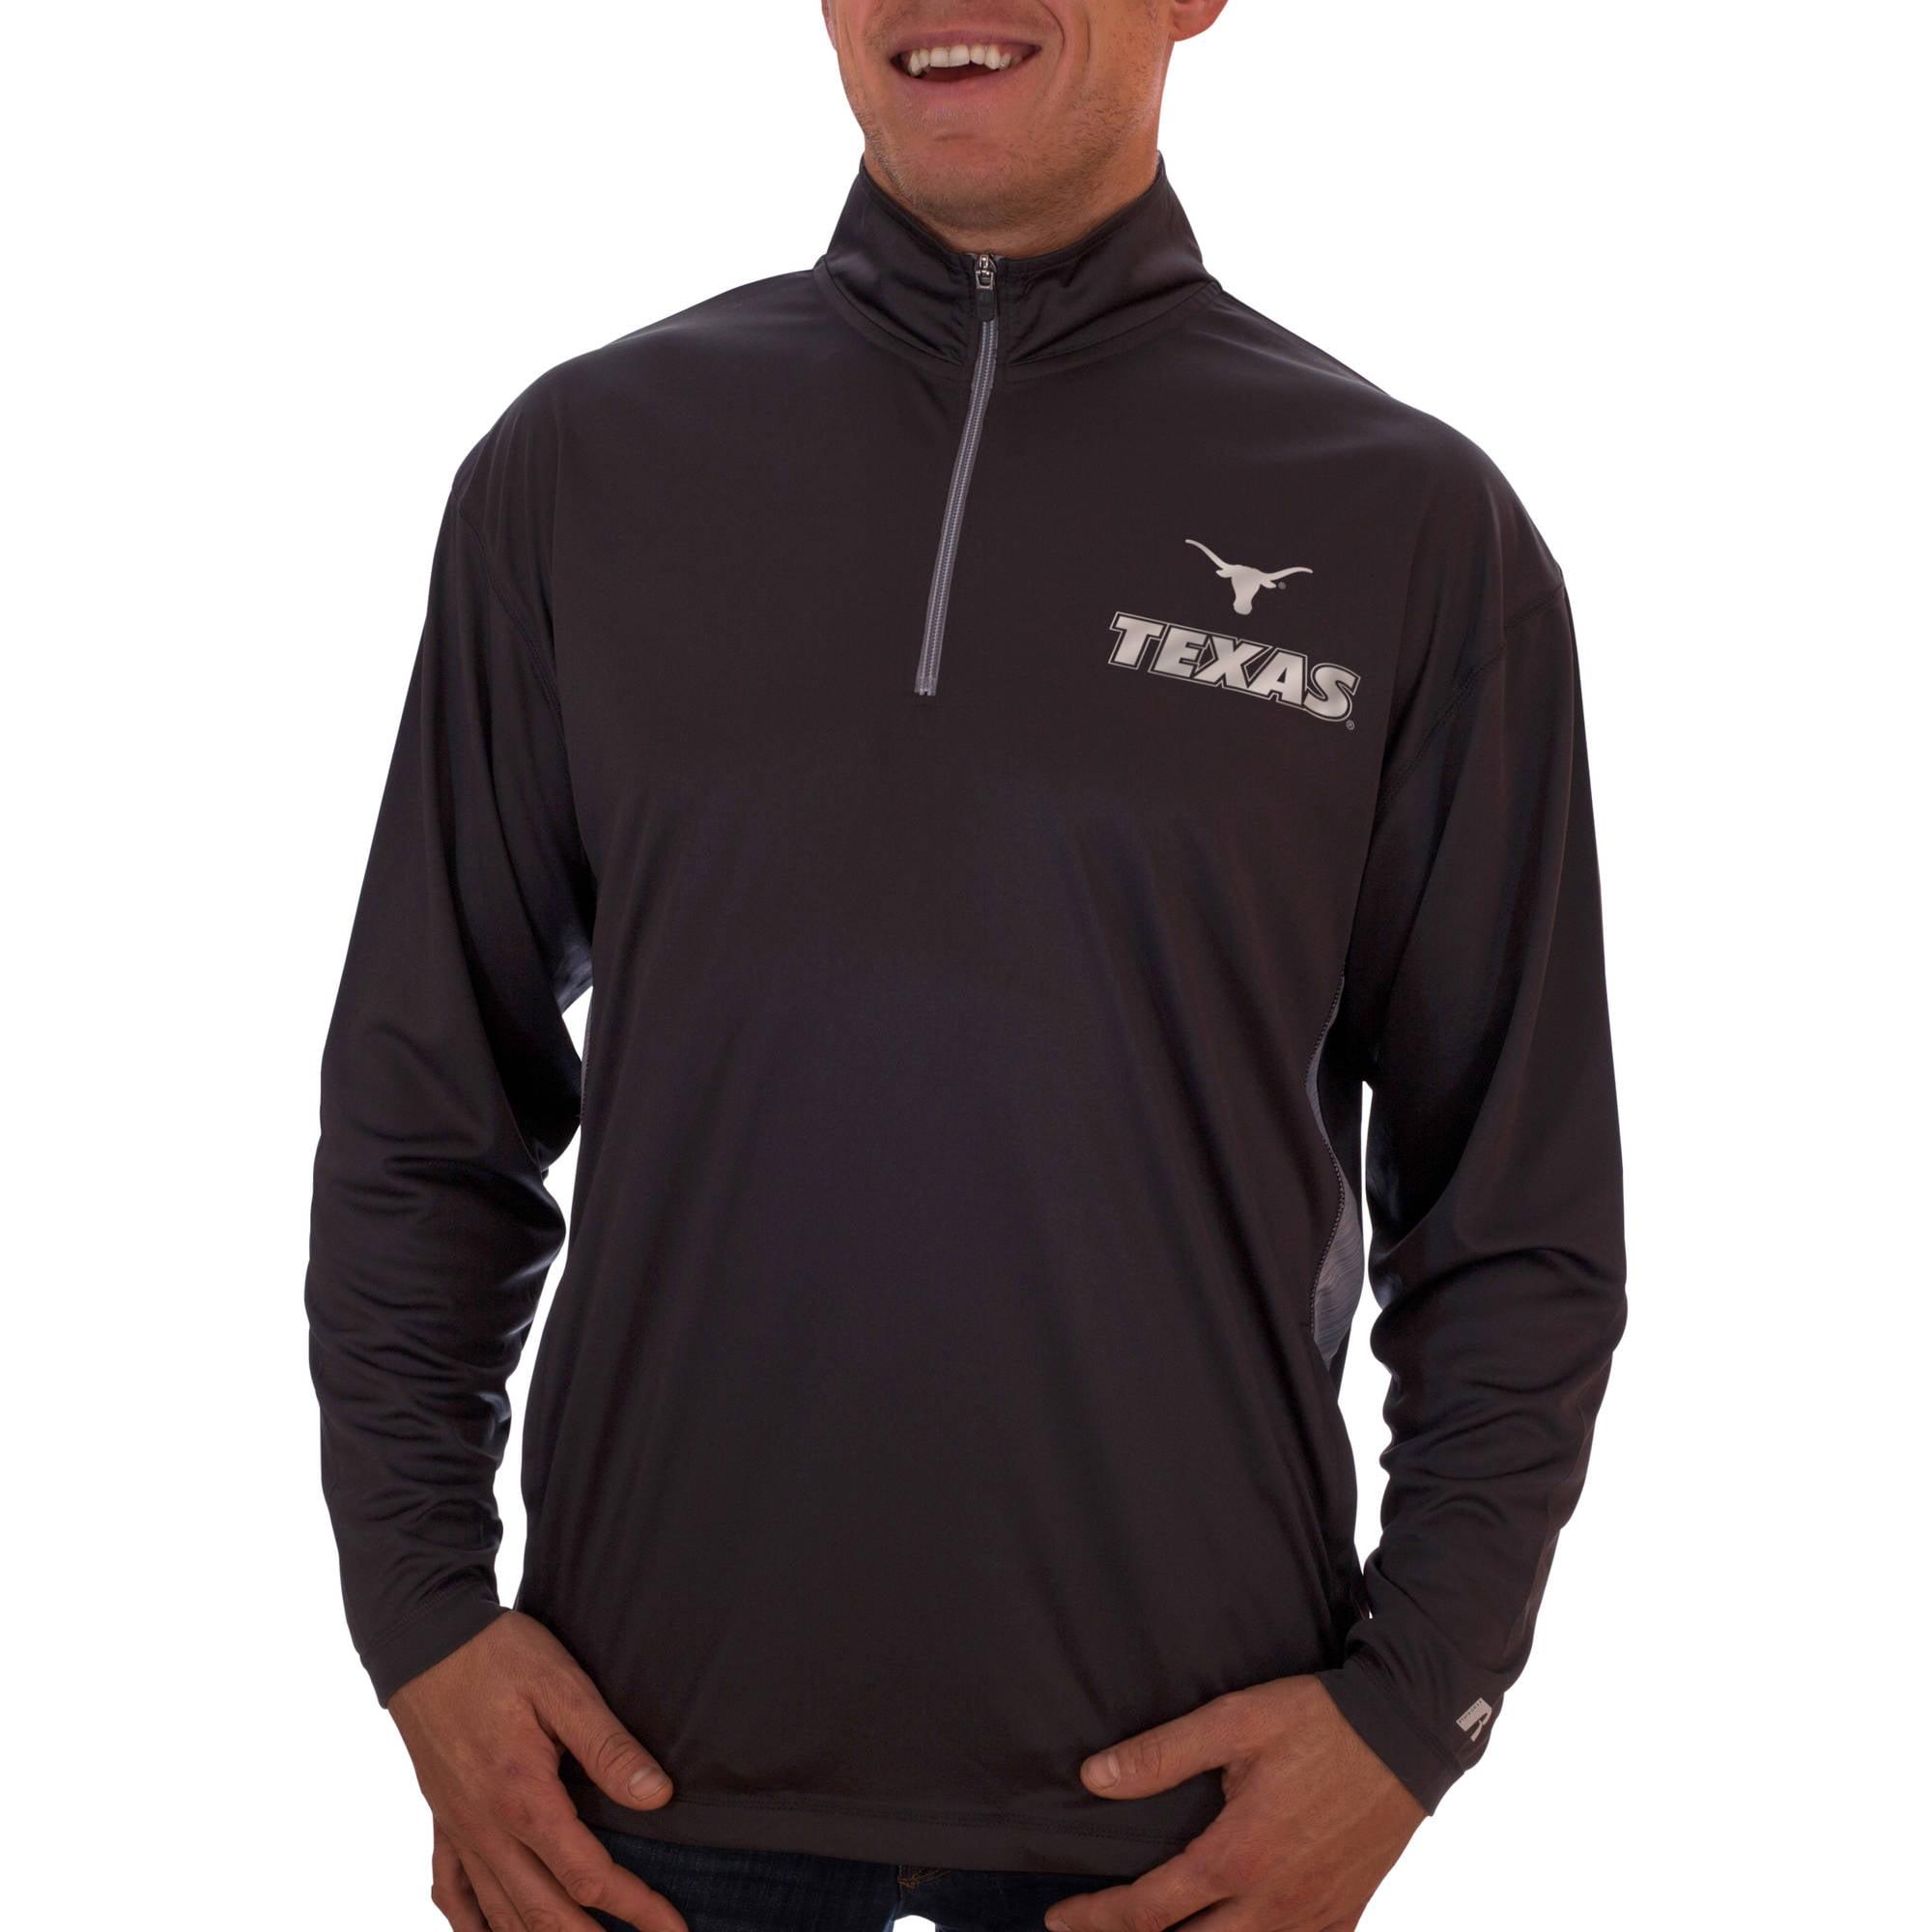 Russell NCAA Texas Longhorns Men's Athletic Fit Black/ Storm Gray 1/4-Zip Fitness Jacket